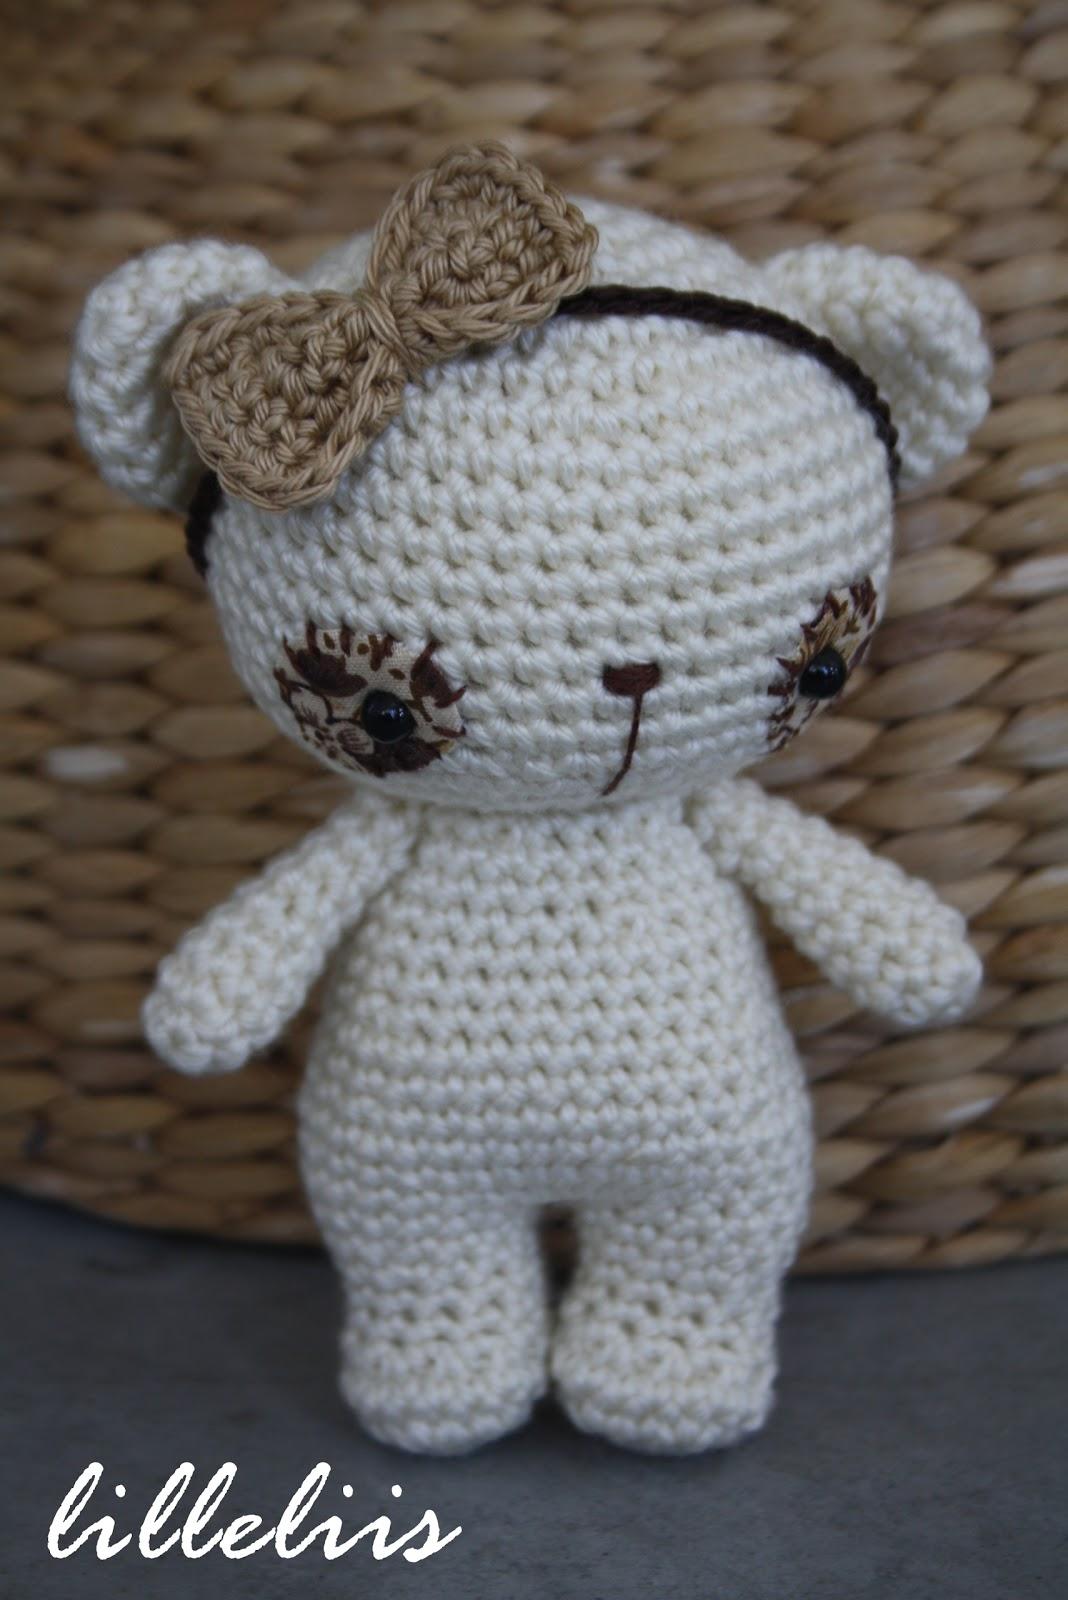 Amigurumi Little Bear : lilleliis.blogspot.com: Piimakaru Matilda - vaike ...